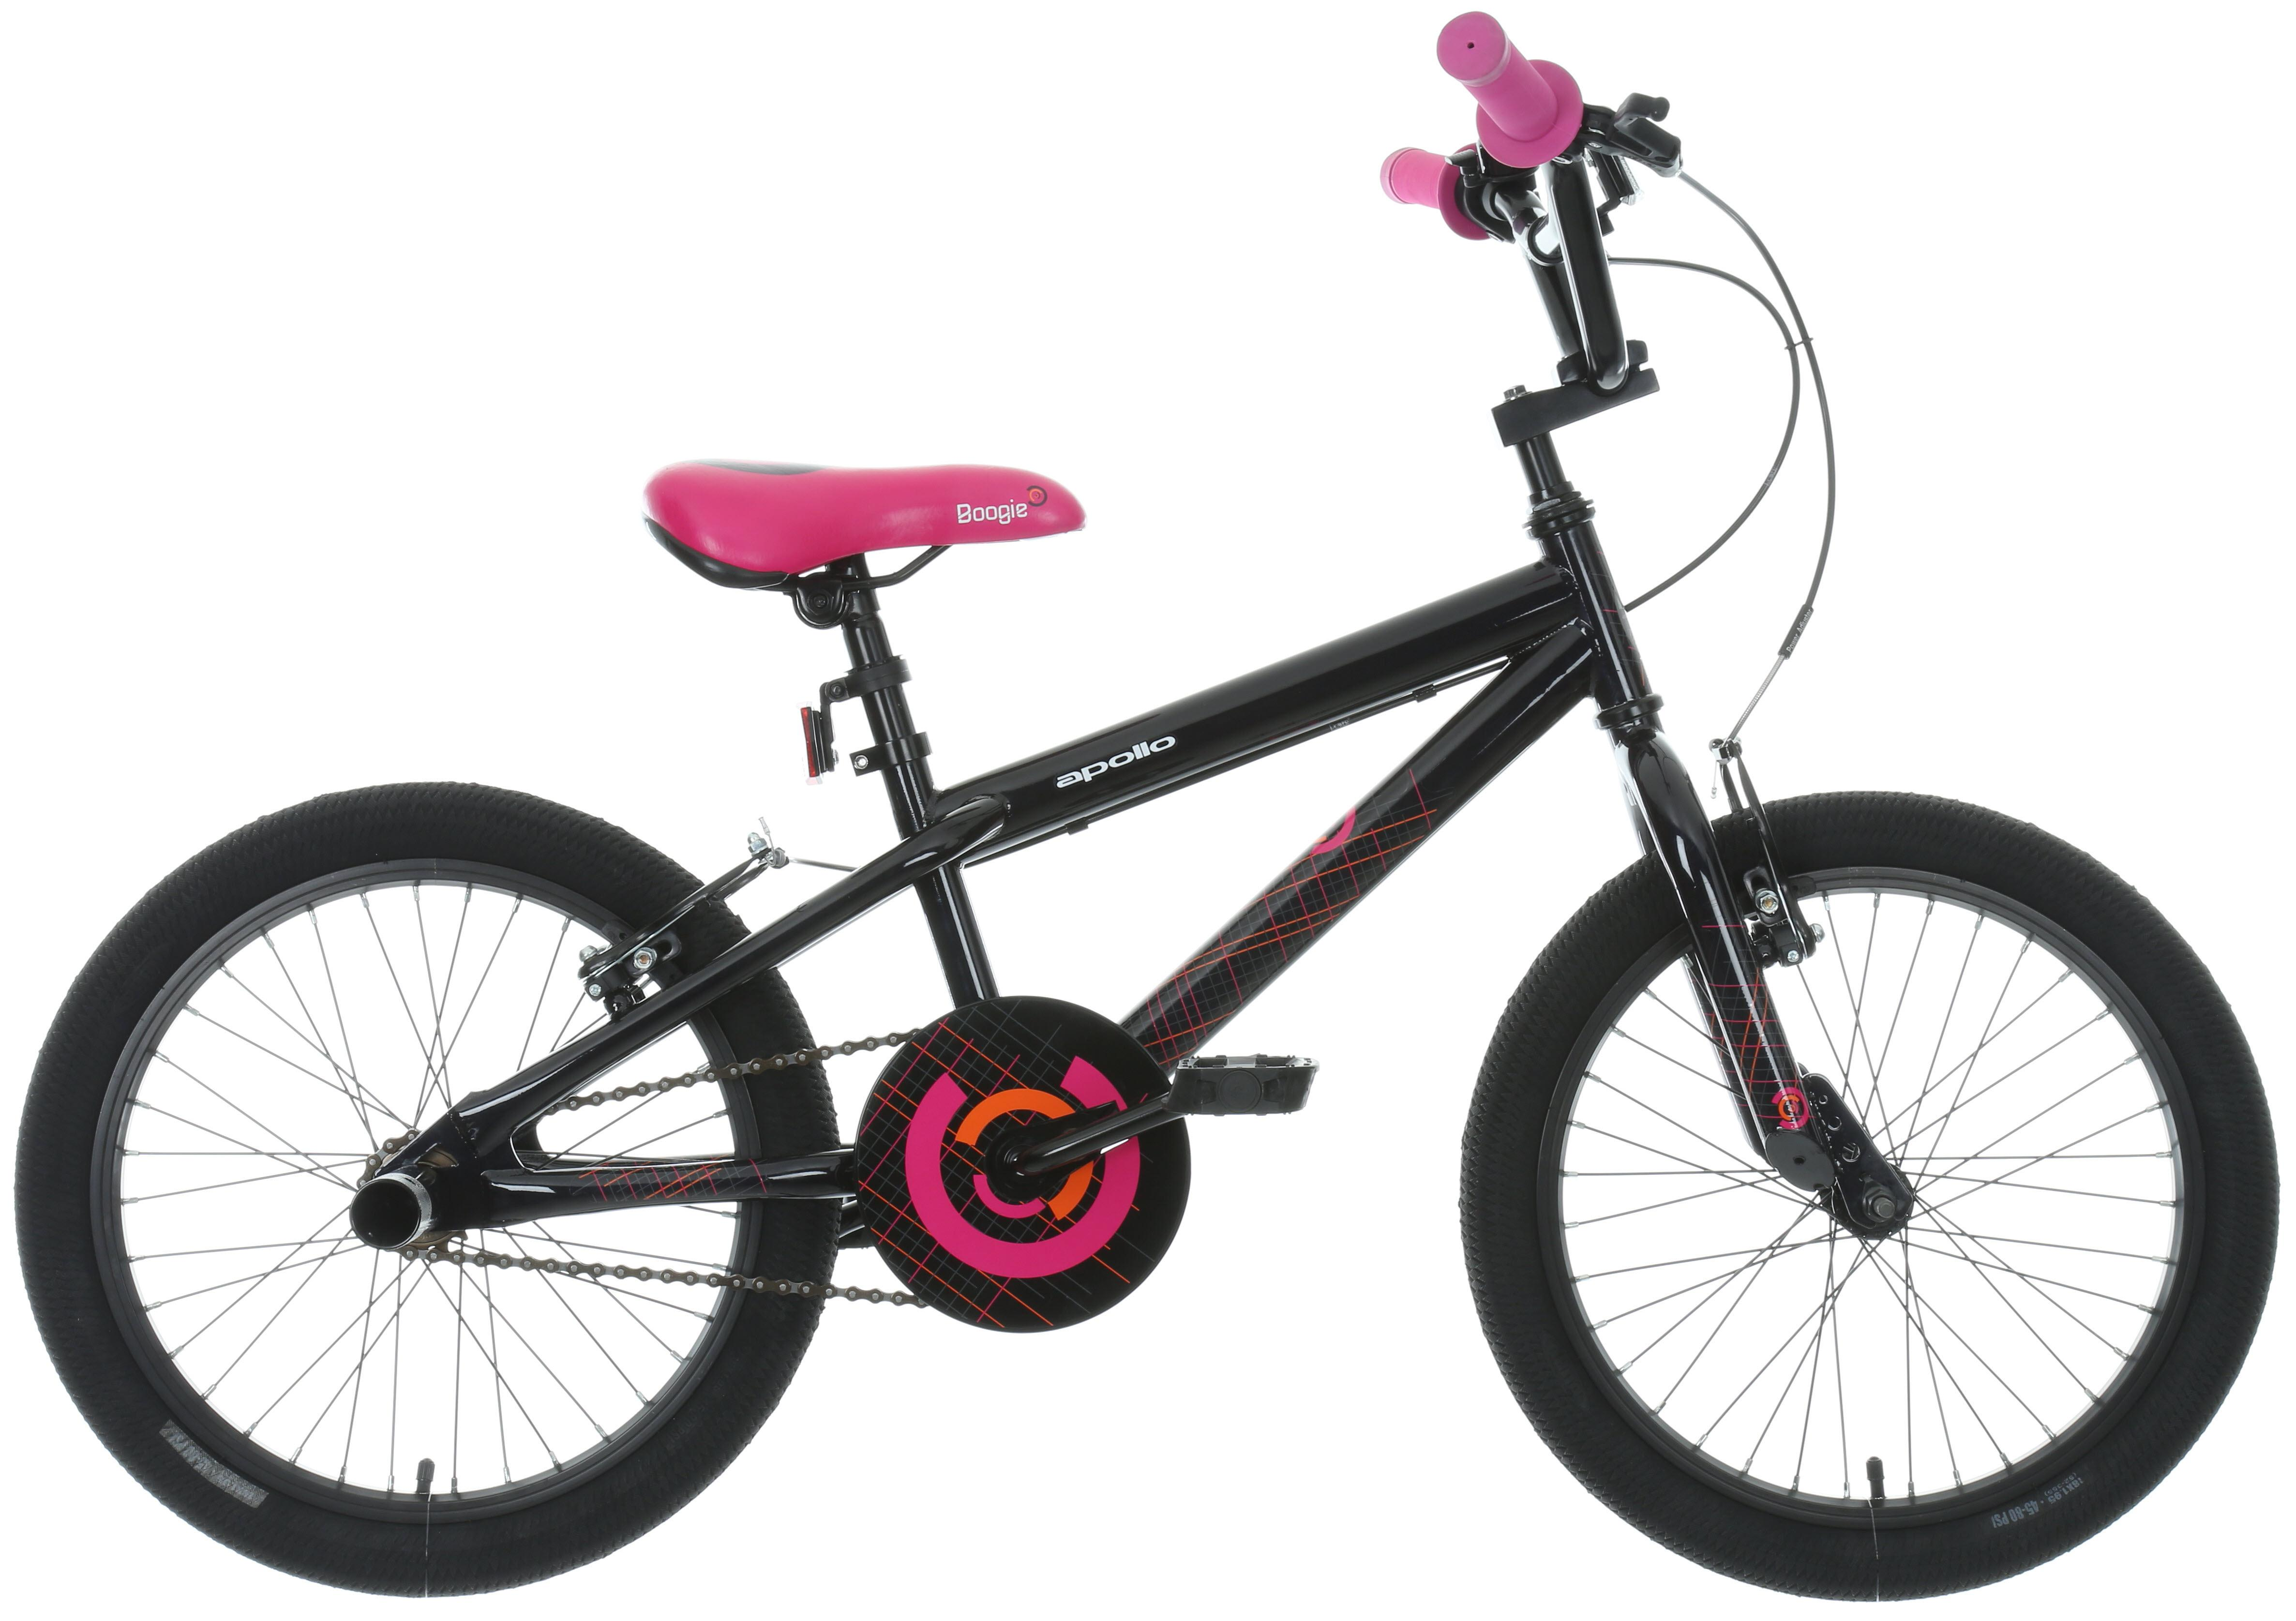 Apollo Boogie Kids Bike   18 Inch Wheel